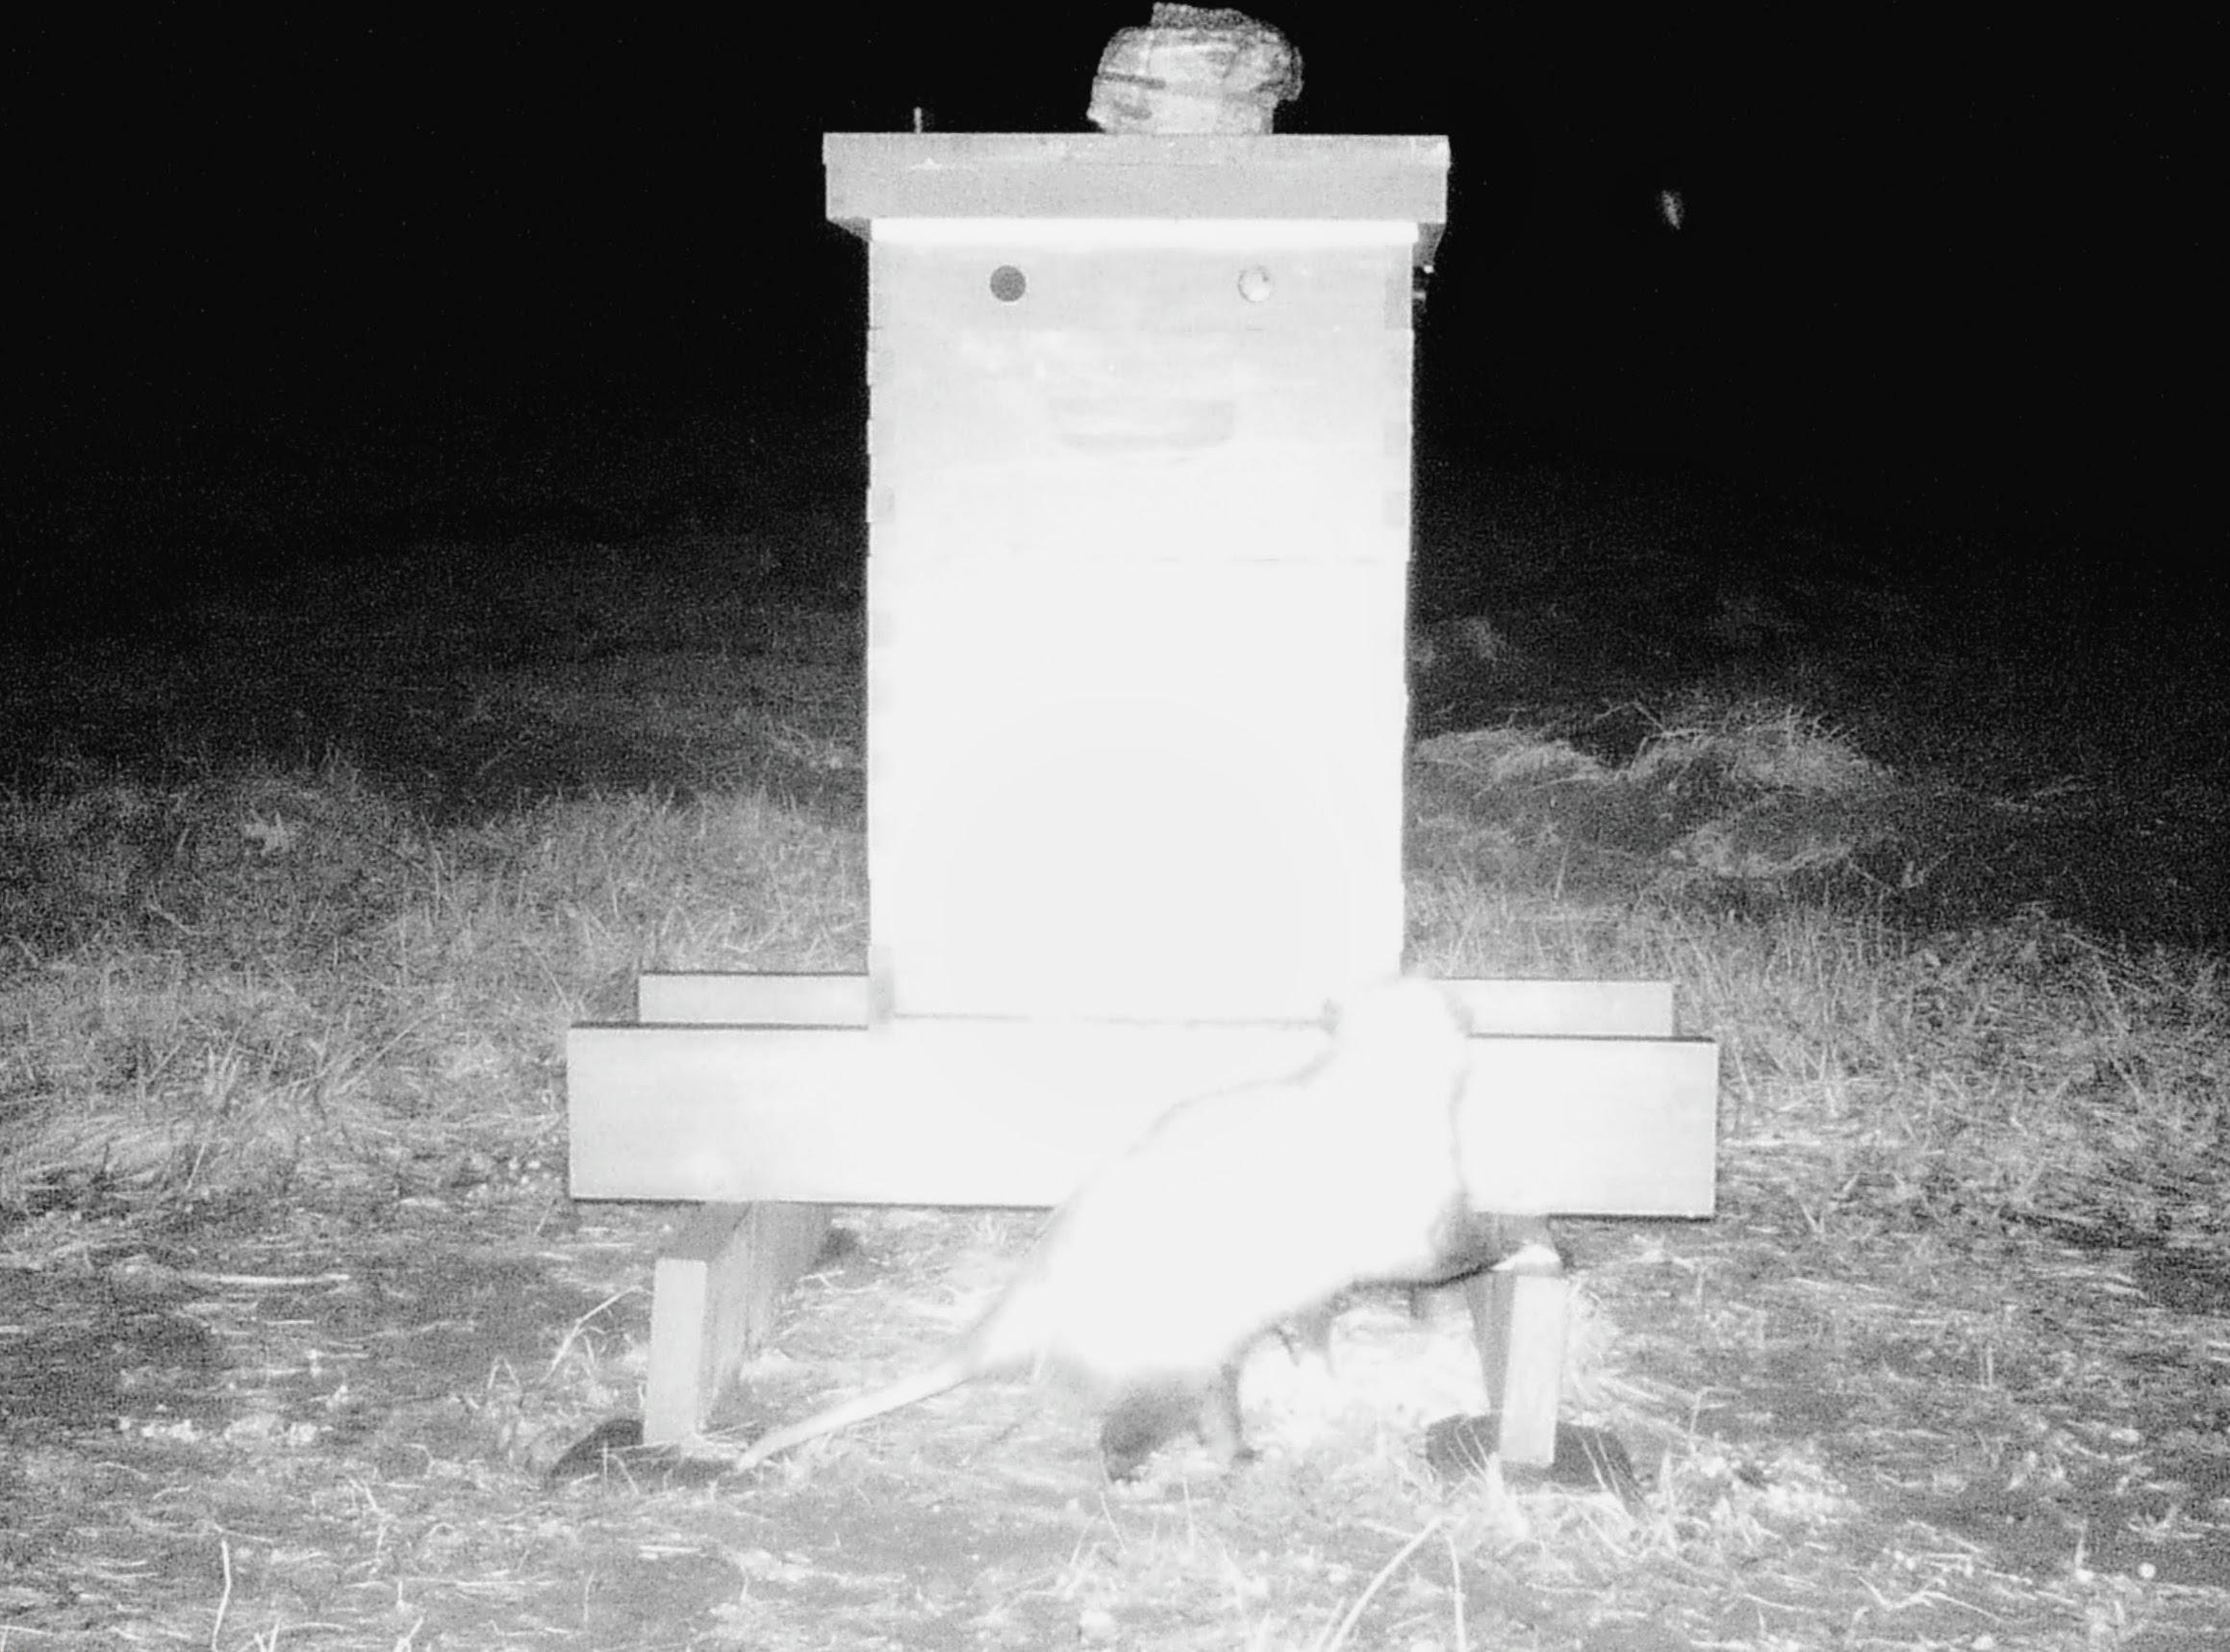 Opossum (possum) at a honey bee hive